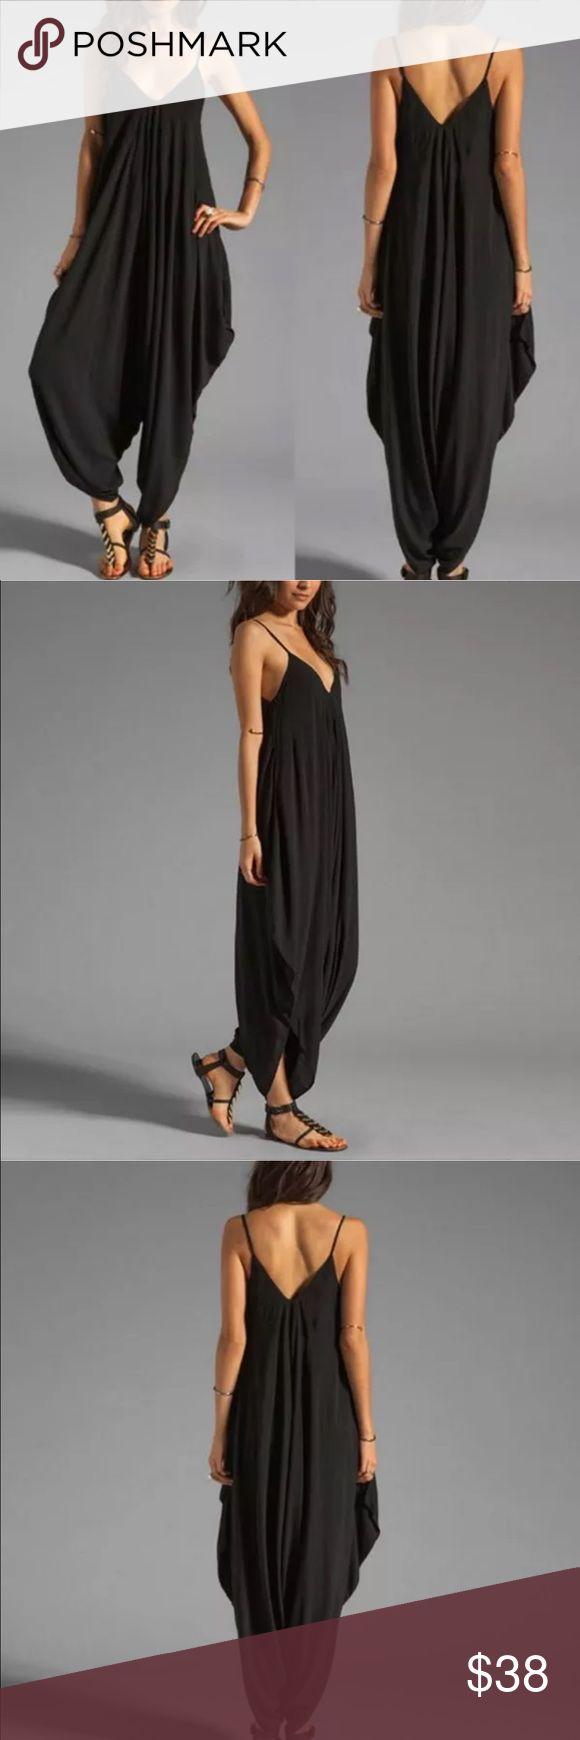 ELEGANT BLACK HAREM JUMPSUIT ✔️ Flowy legged Jumpsuit!! SUPER classy and elegant. Plus super comfortable!! ✔️ ••••PRICE IS FIRM UNLESS BUNDLED•••• Limited availability Pants Jumpsuits & Rompers